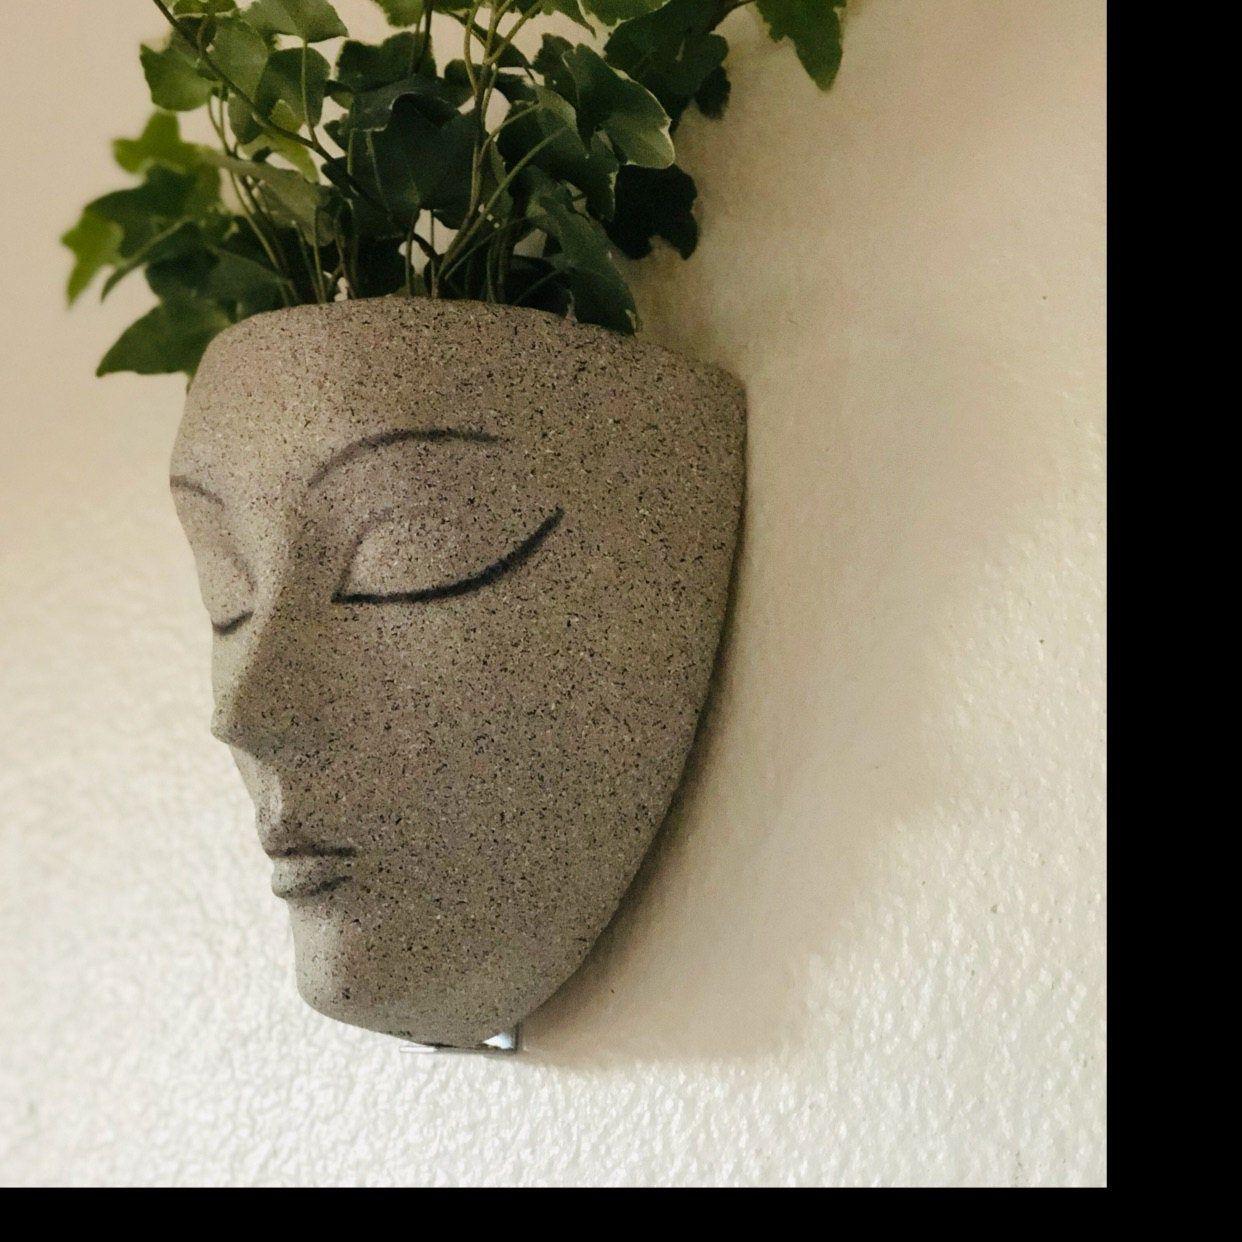 Pflanzer Topfe Fur Pflanzen Wandpflanzer Wandkunst Etsy Wall Planter Head Planters Planters